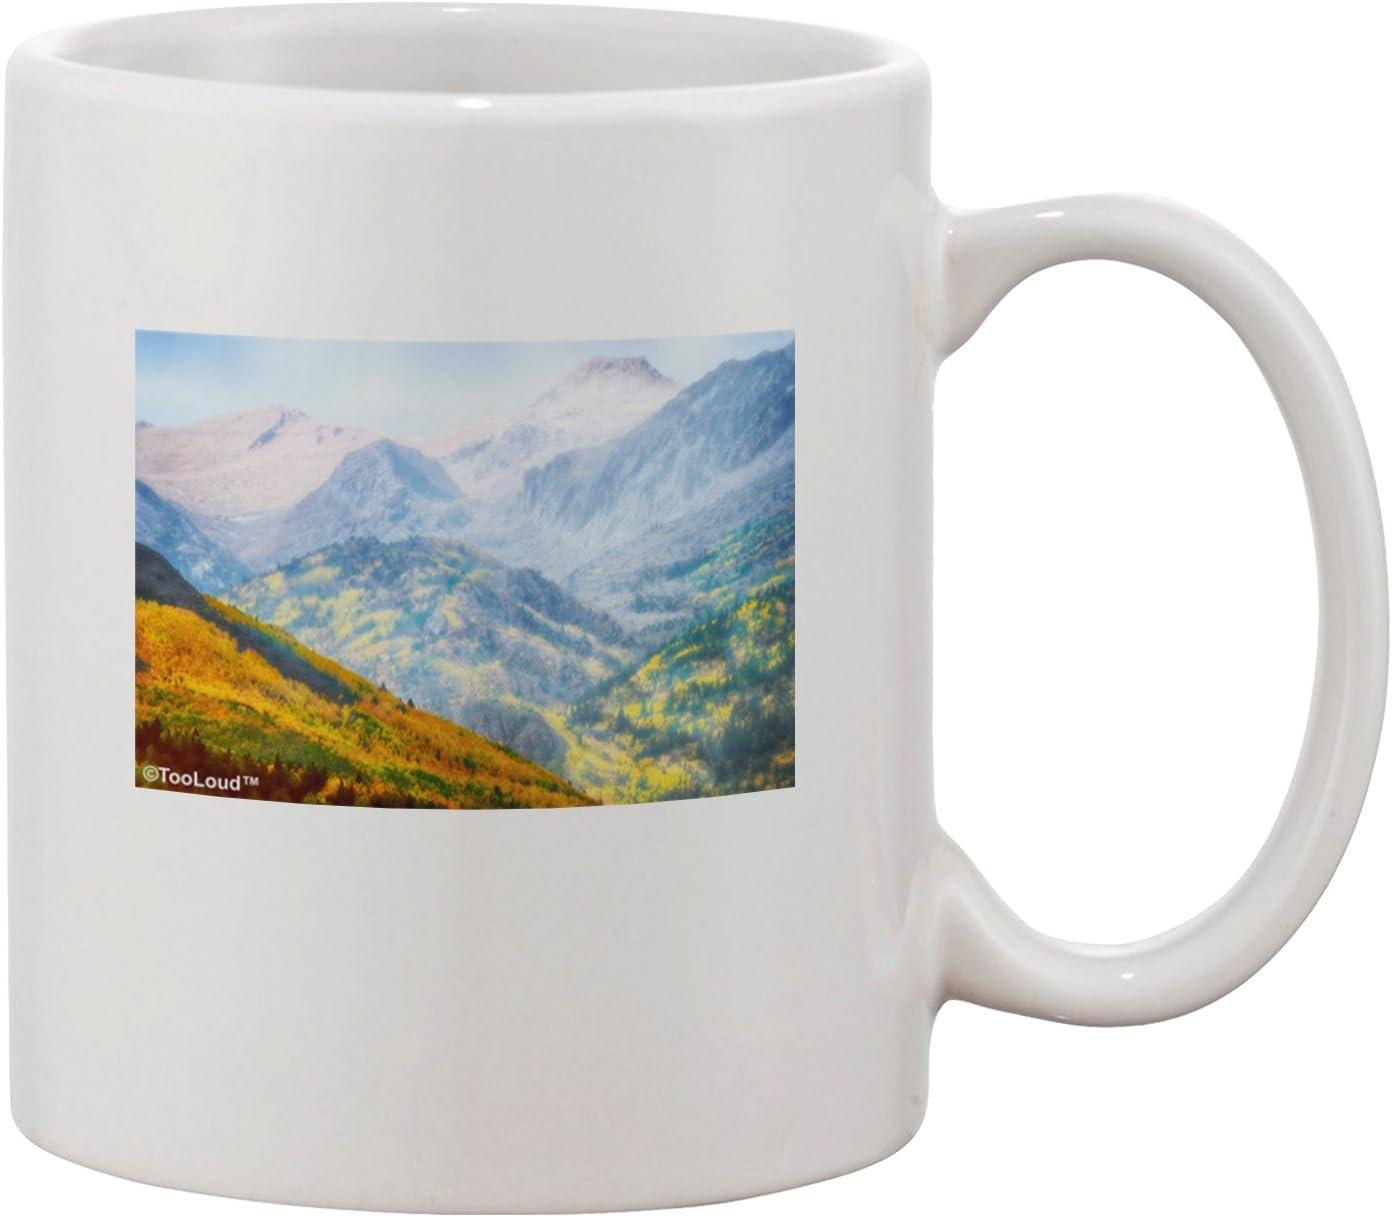 Tooloud Colorado Fog Mountains Printed 11oz Coffee Mug Kitchen Dining